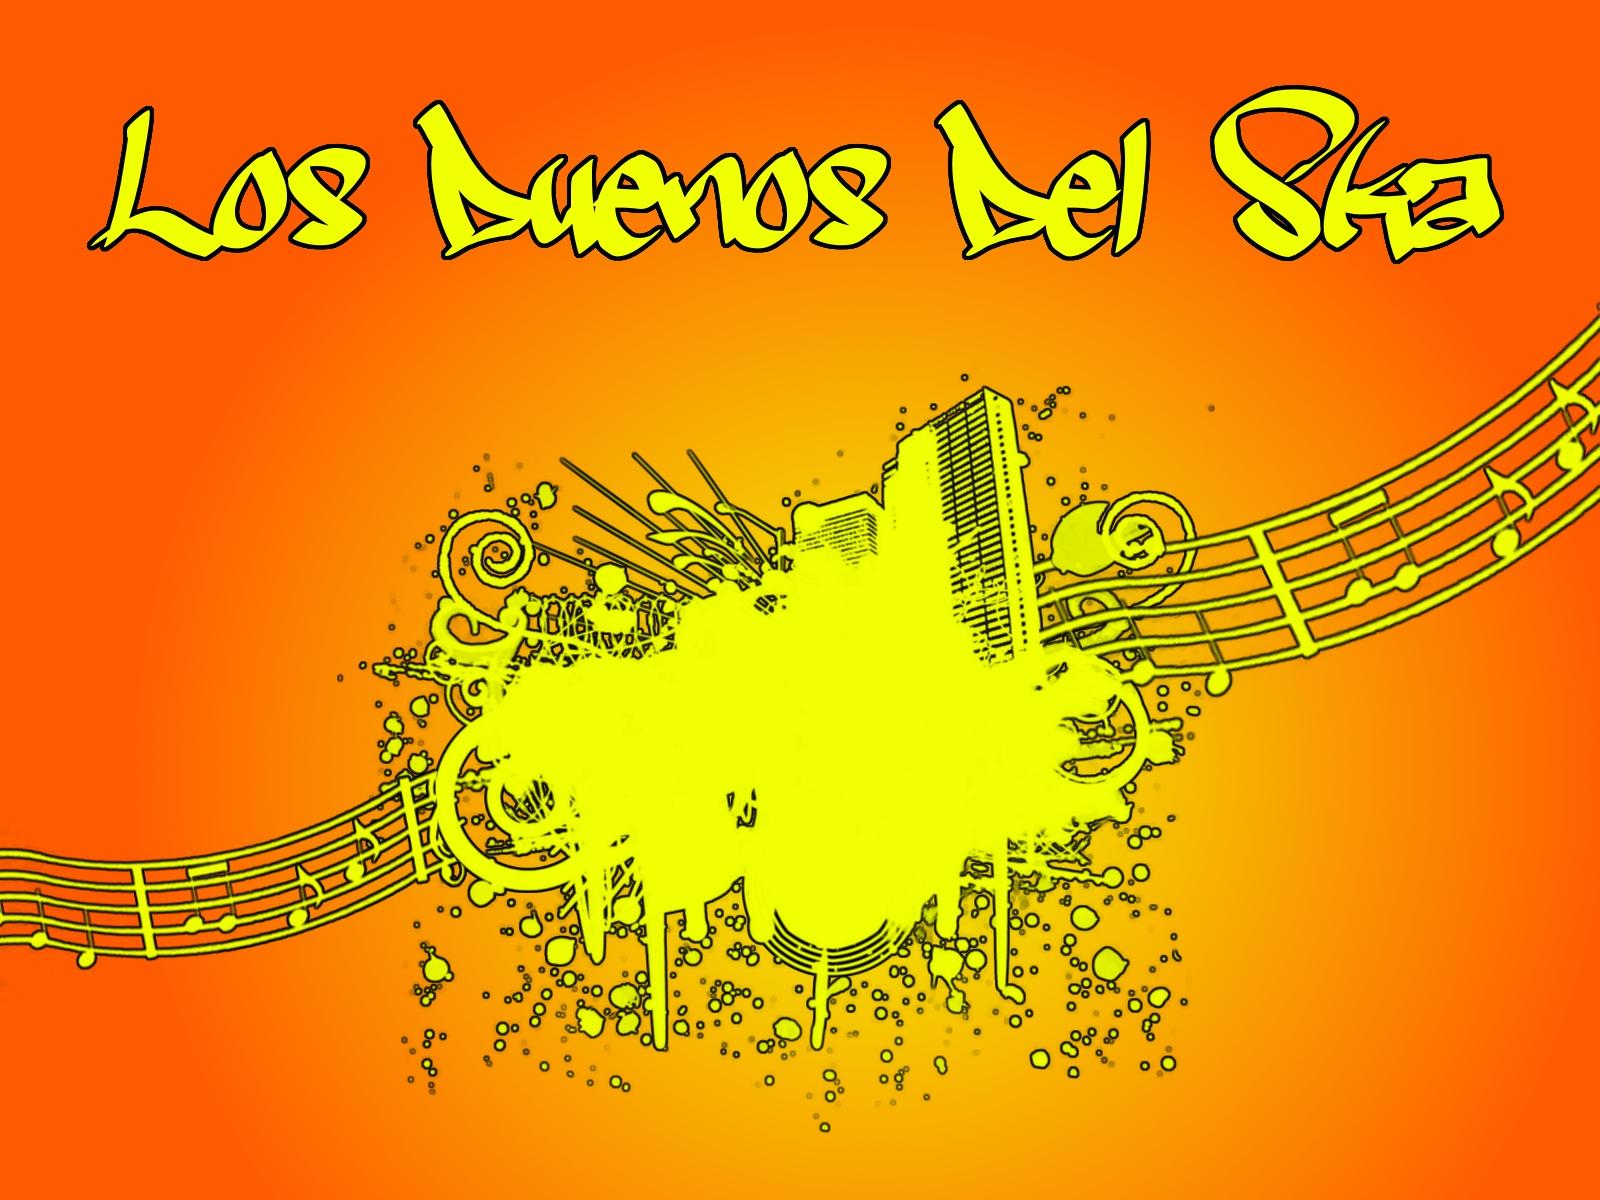 http://4.bp.blogspot.com/-ACbRBLtUIMg/Tayf4Te6ZSI/AAAAAAAAAIw/LxeQJJg-E48/s1600/los+duenos+del+ska+wallpaper+2.jpg